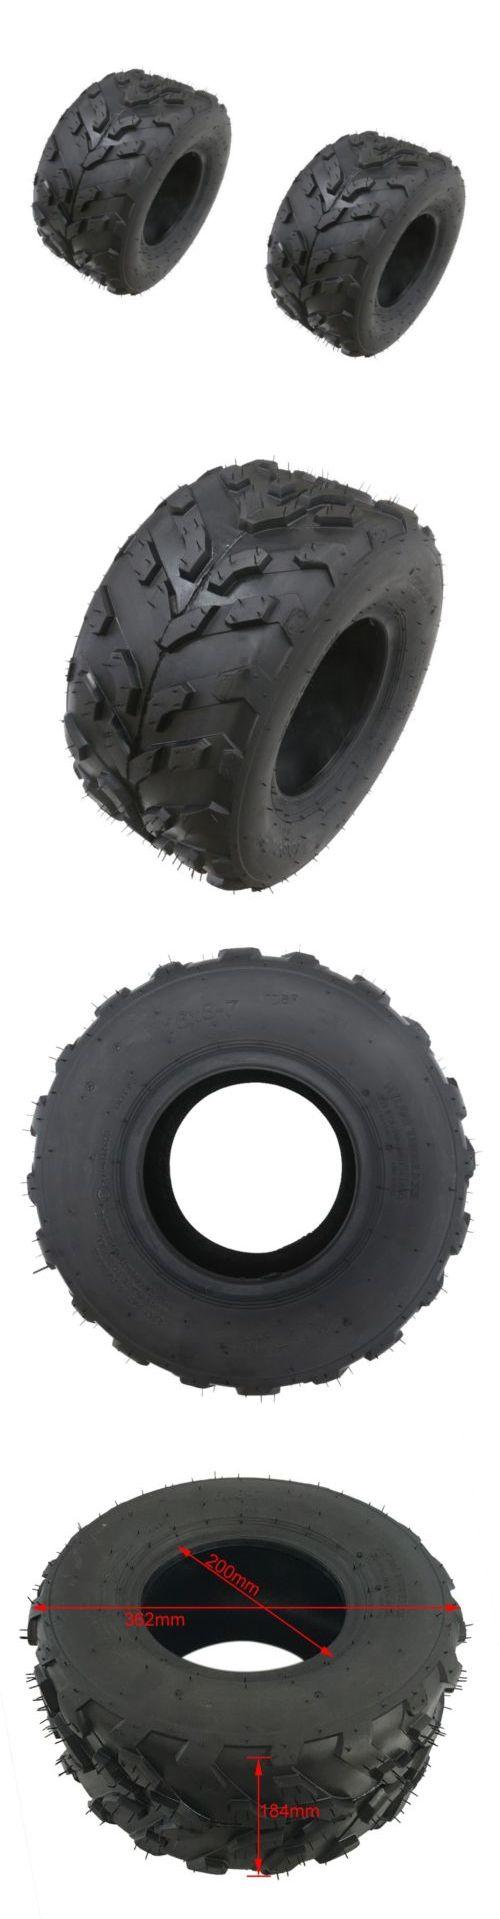 Training Wheels 177839: 2X Tires 16X8-7 7 Tyres For Atv Quad Dirt Bike 70Cc 110Cc 125Cc 150Cc Us Stock -> BUY IT NOW ONLY: $65.79 on eBay!